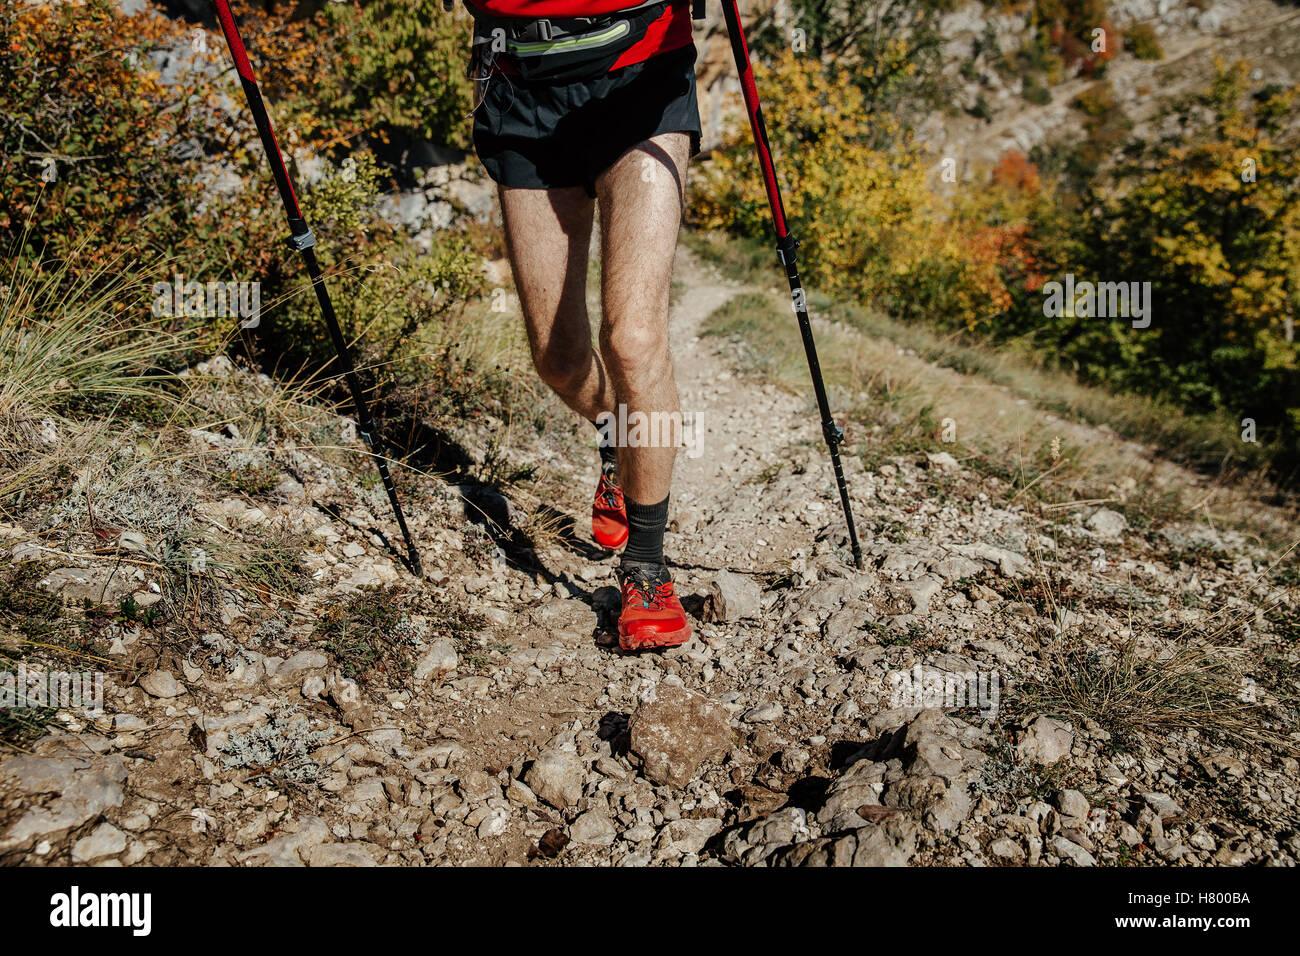 closeup feet  runner athlete and walking sticks on a mountain trail Stock Photo